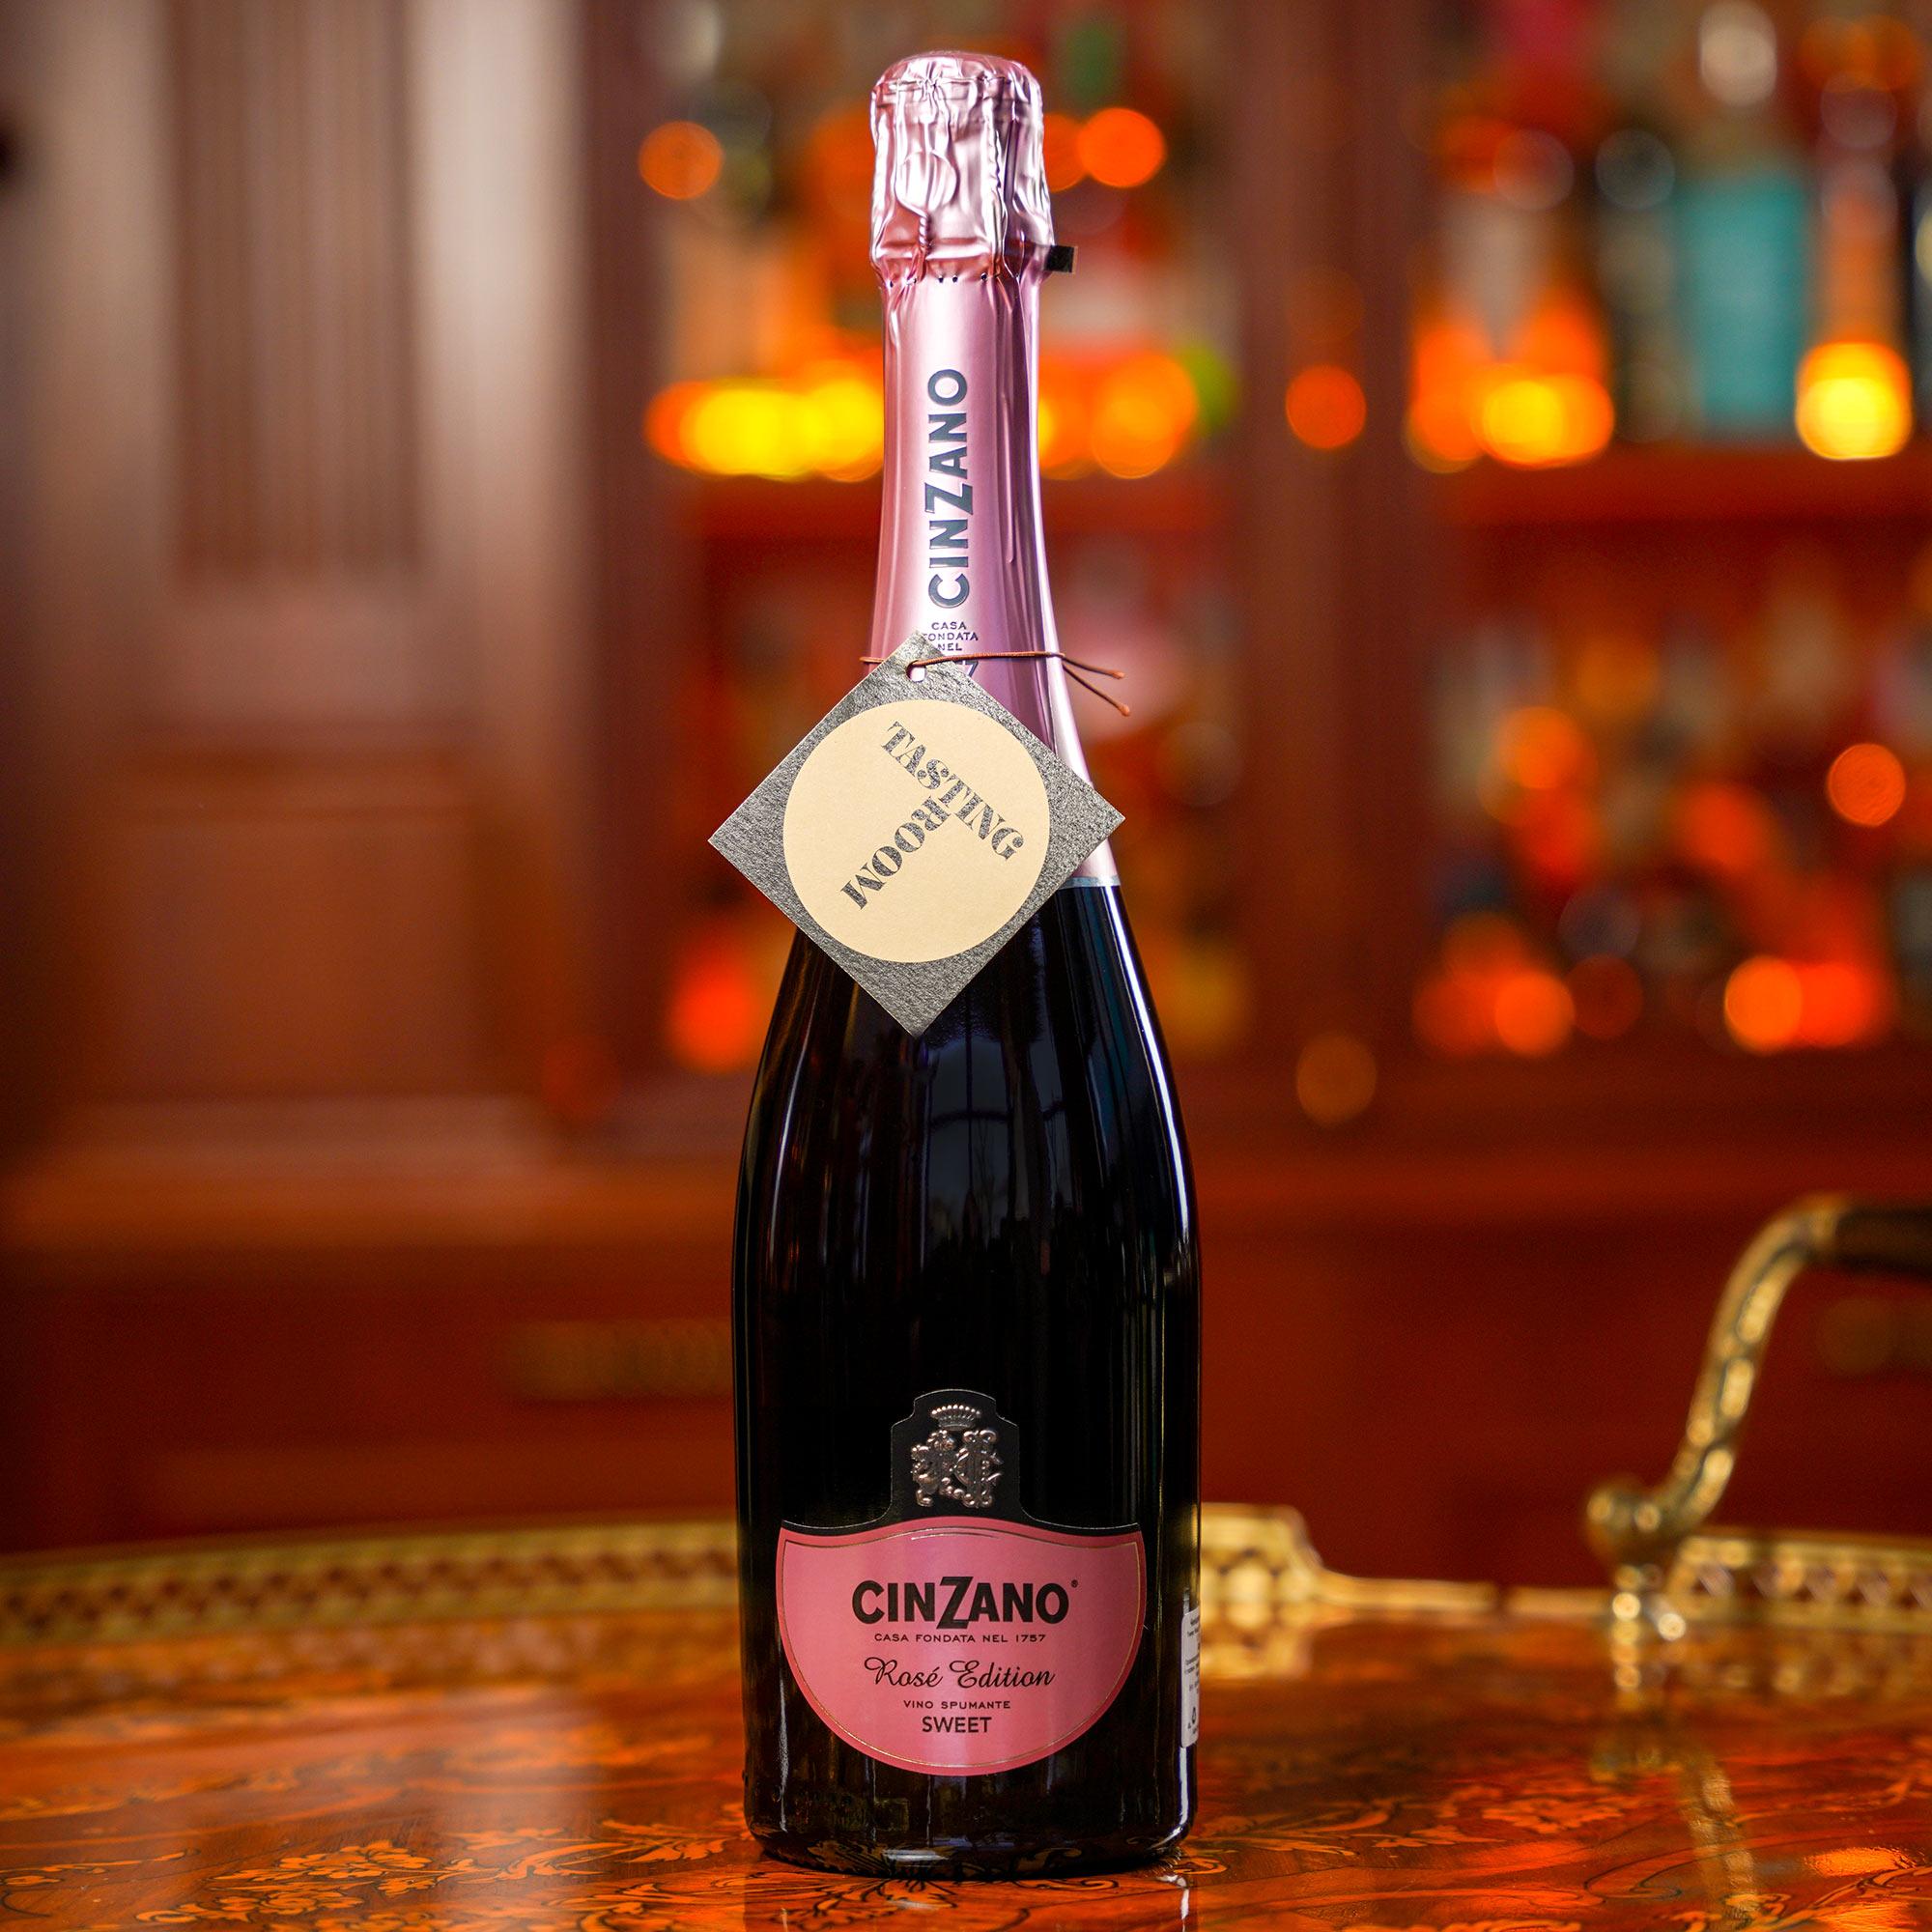 Cinzano Rose Edition / Чинцано или Чинзано Розе Едишън